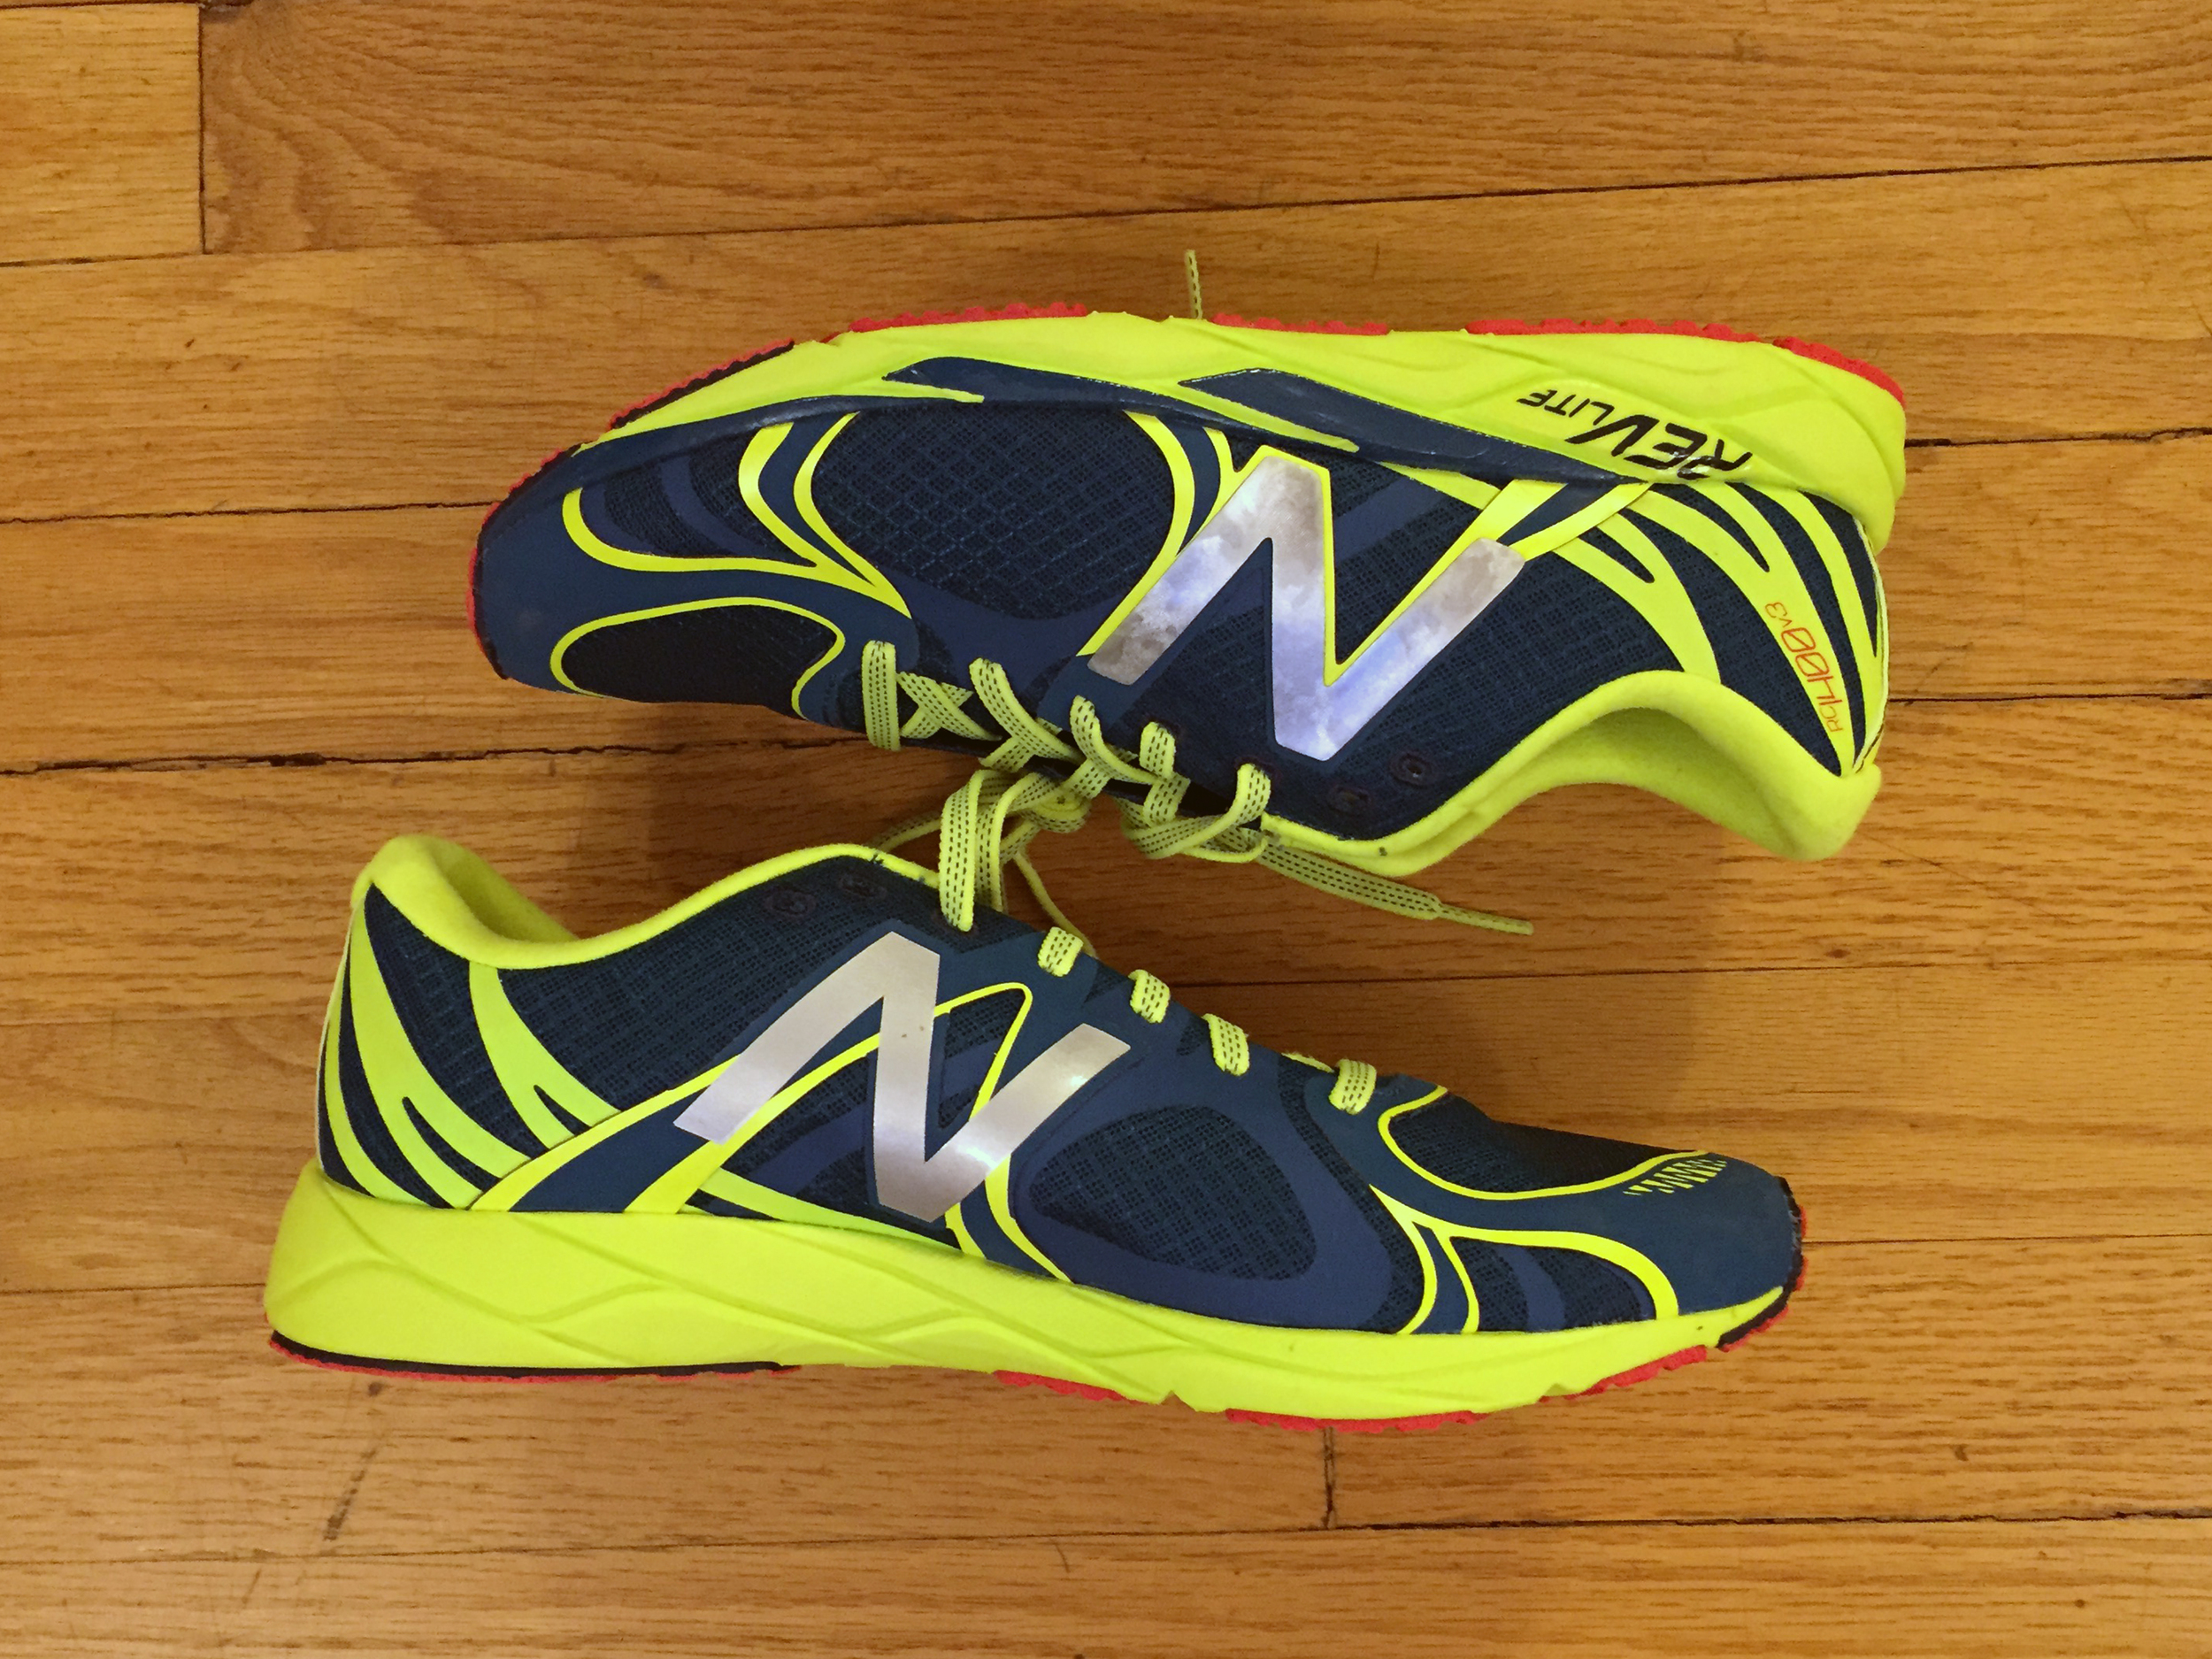 New Balance 1400v3 Road Shoe